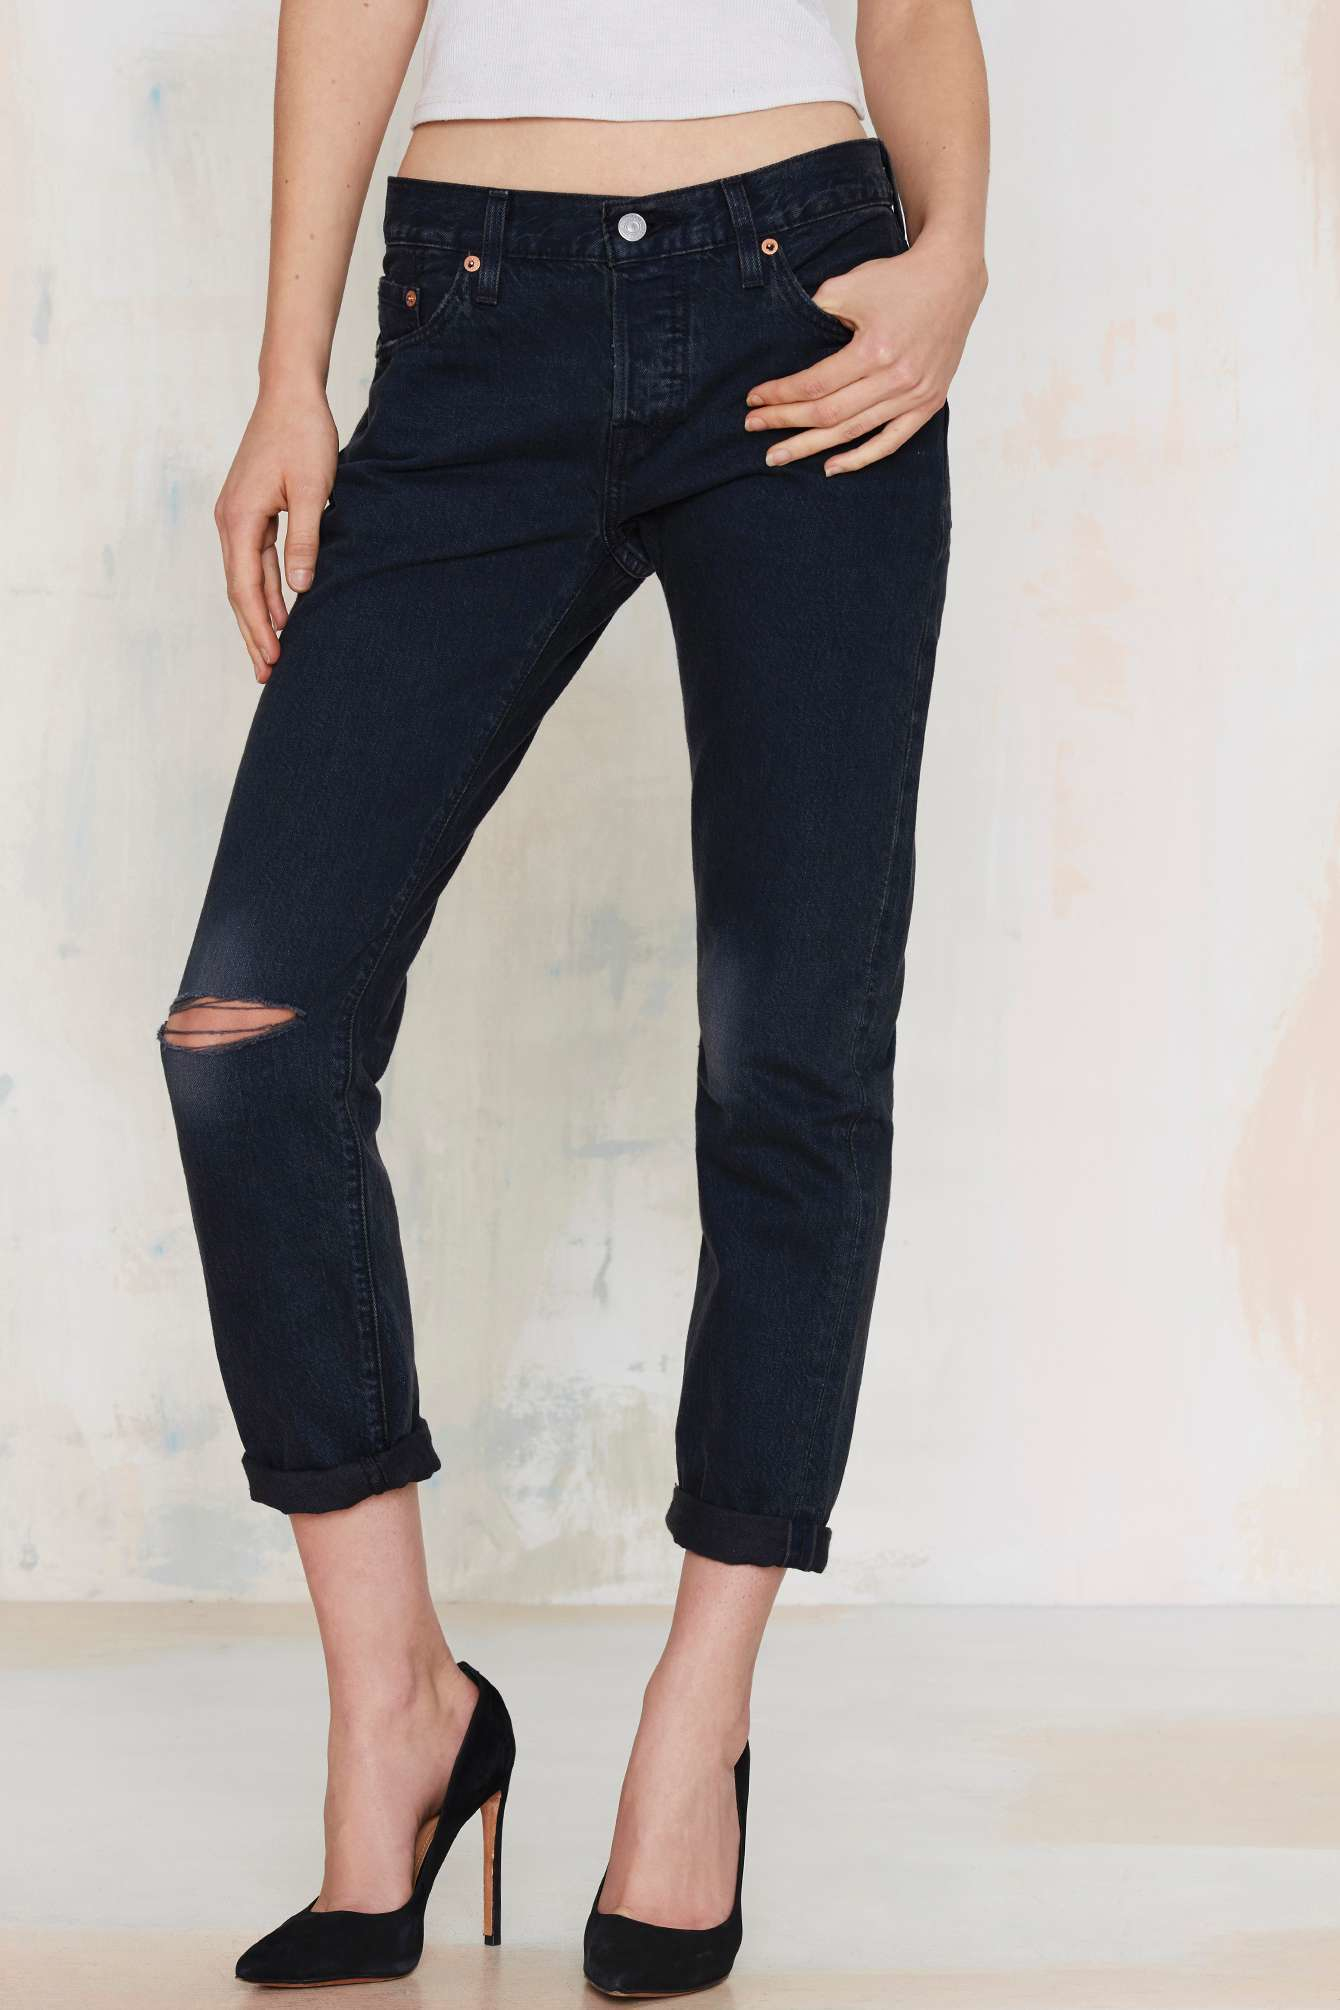 Black 501 Jeans Ct Lyst Heyday In Gal Nasty Levi's wOPXNn0kZ8